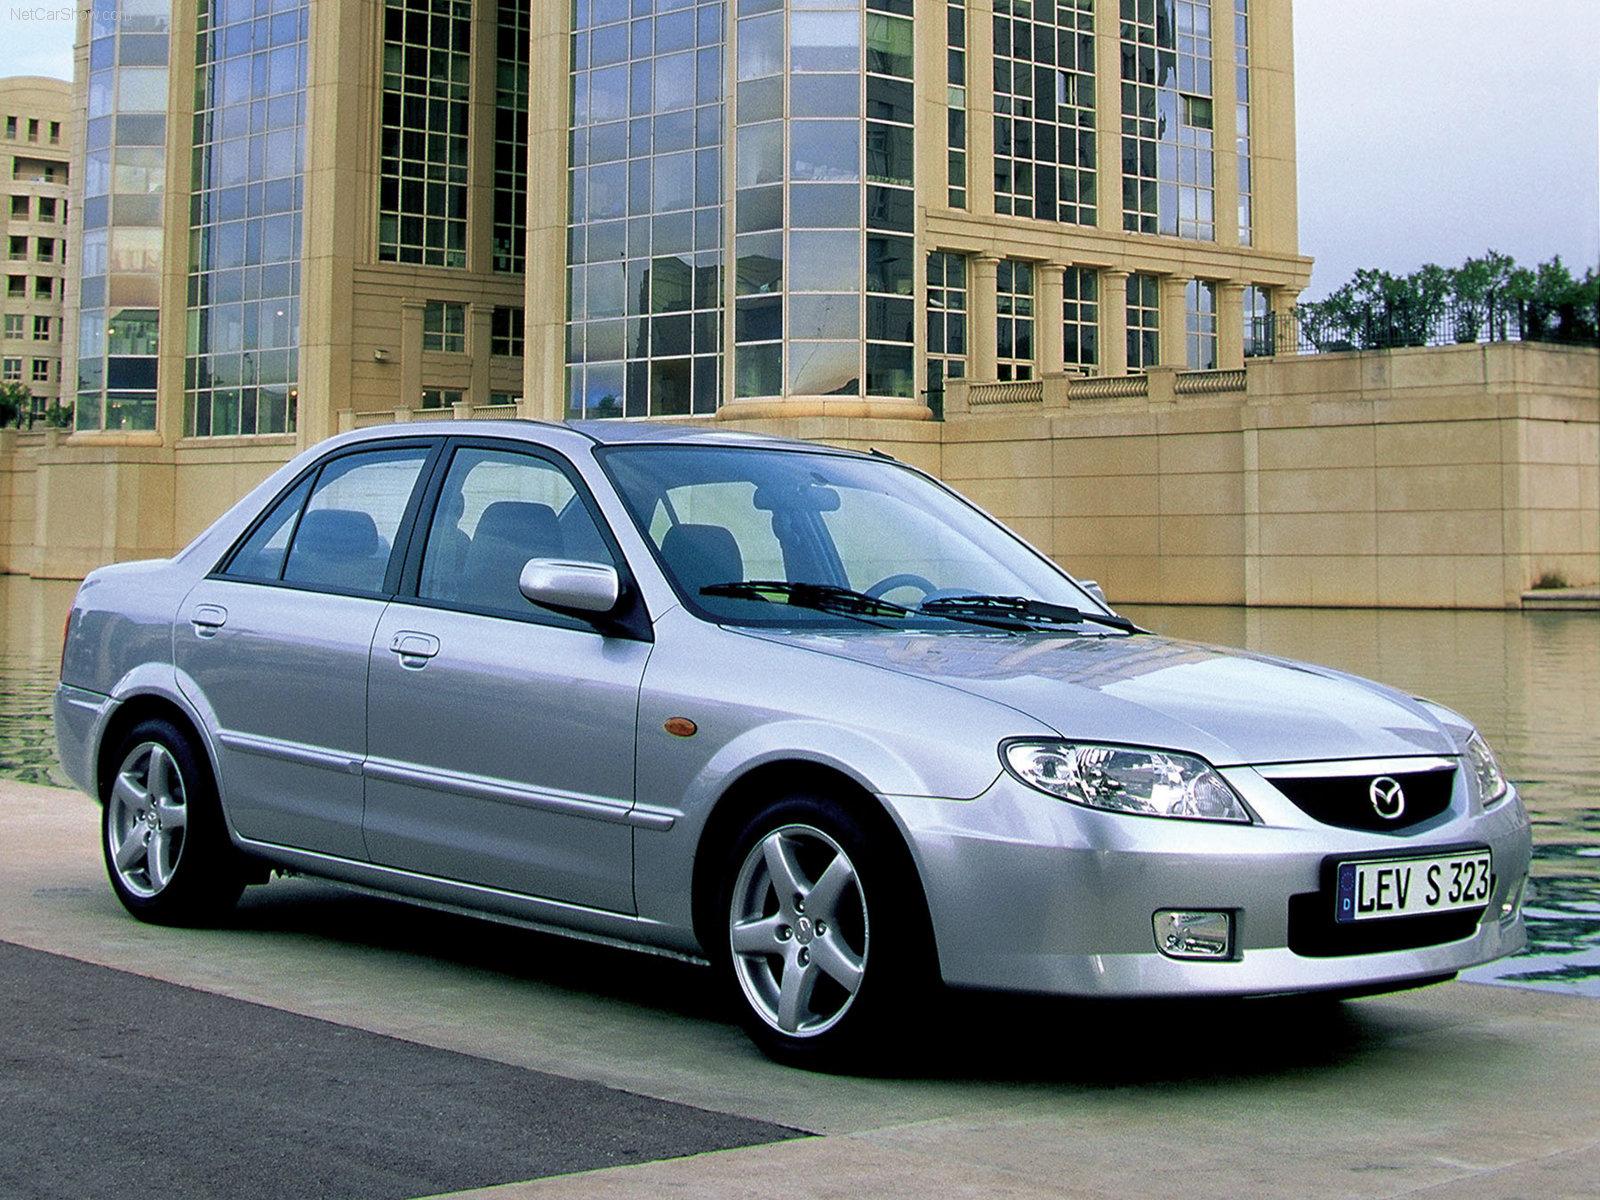 3dtuning of mazda familia sedan 2001 3dtuning - unique on-line